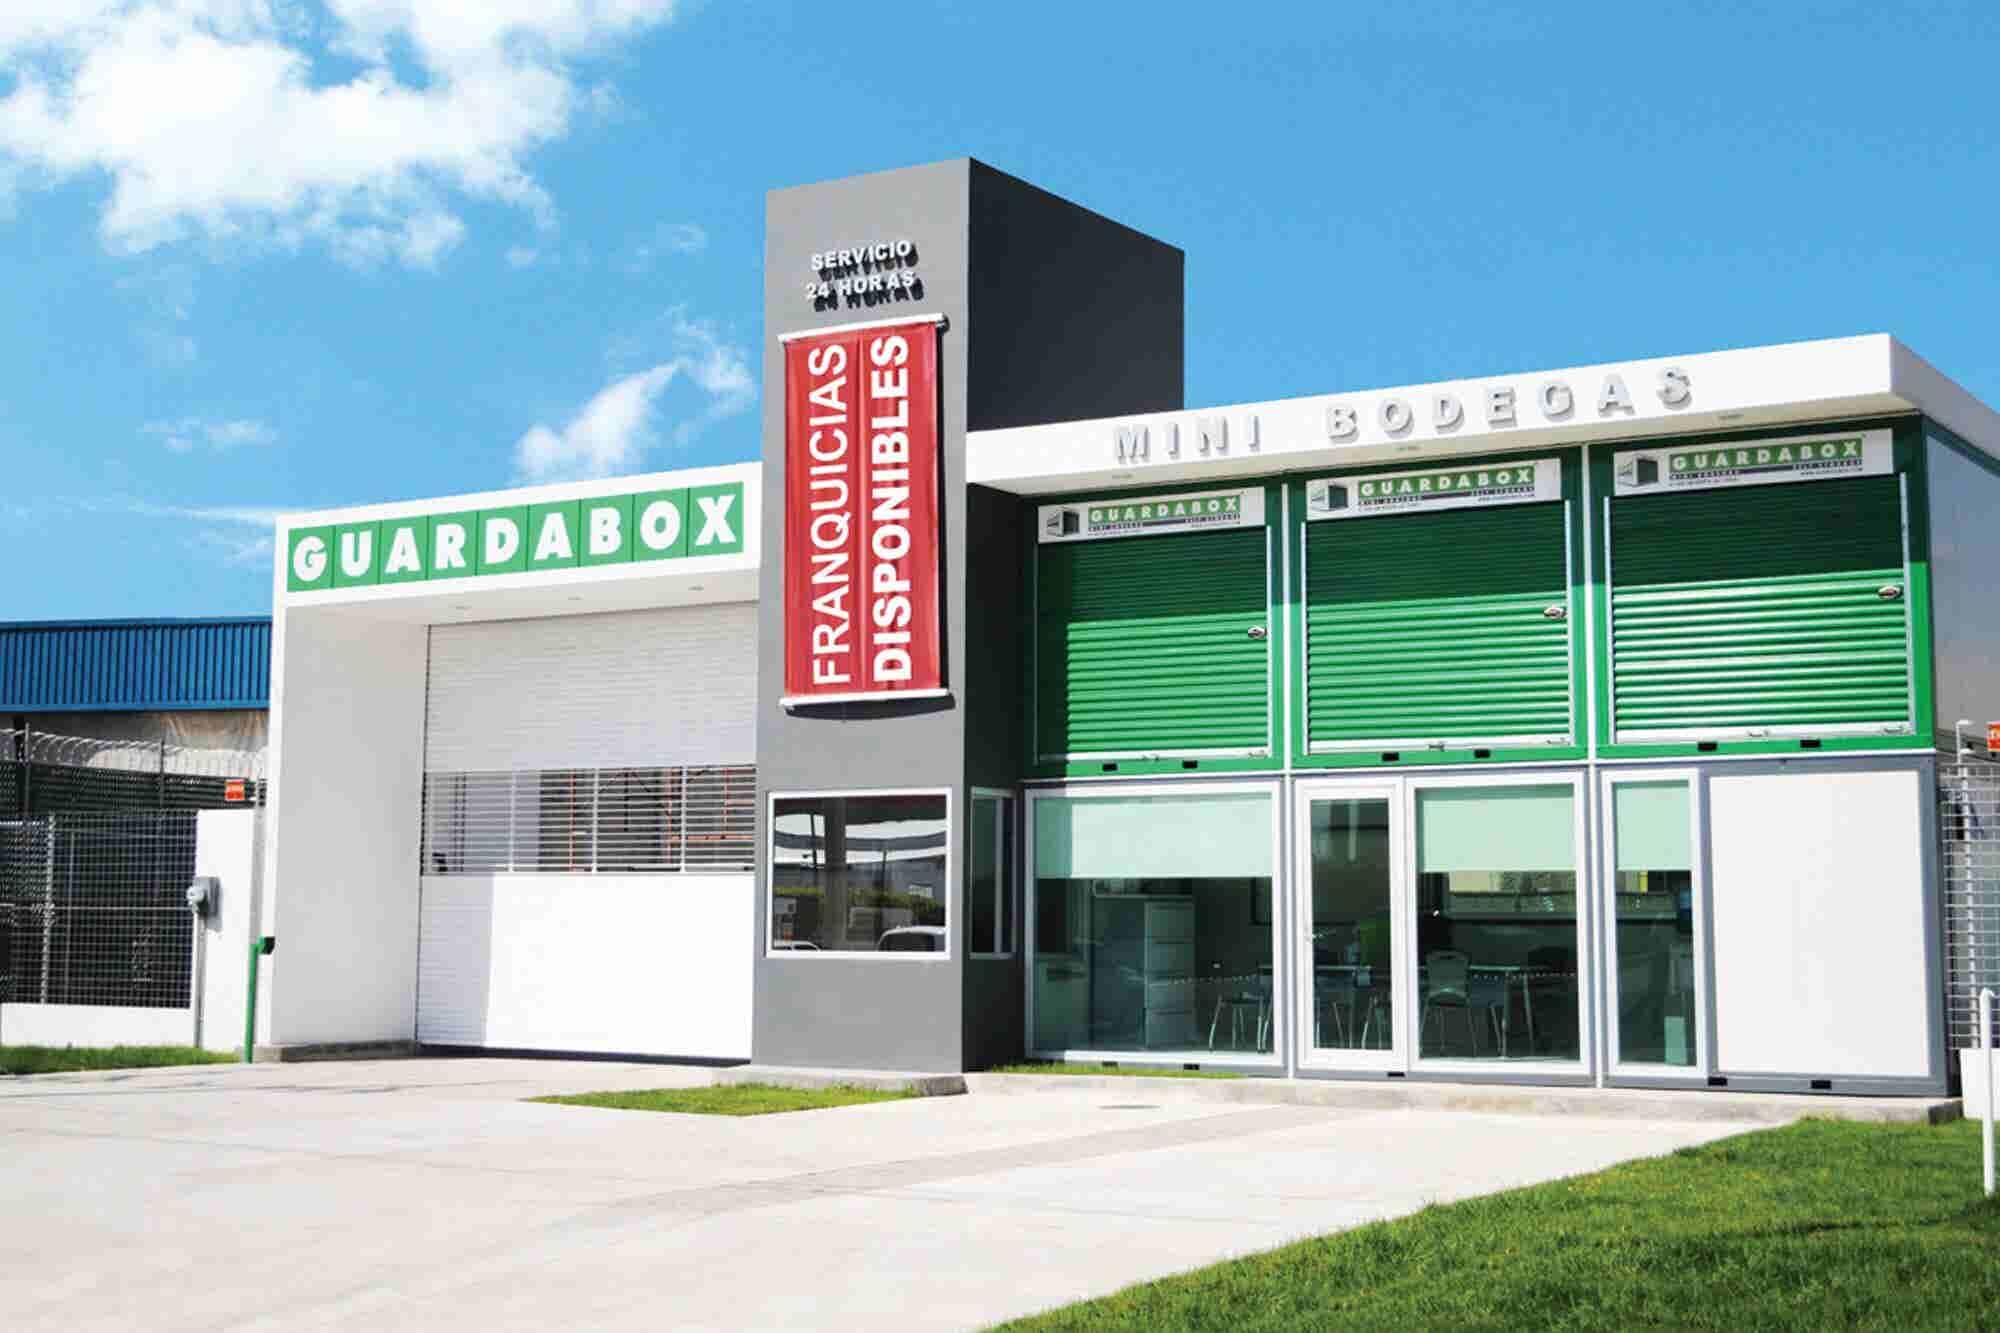 Guardabox la mejor inversi贸n para almacenar retails